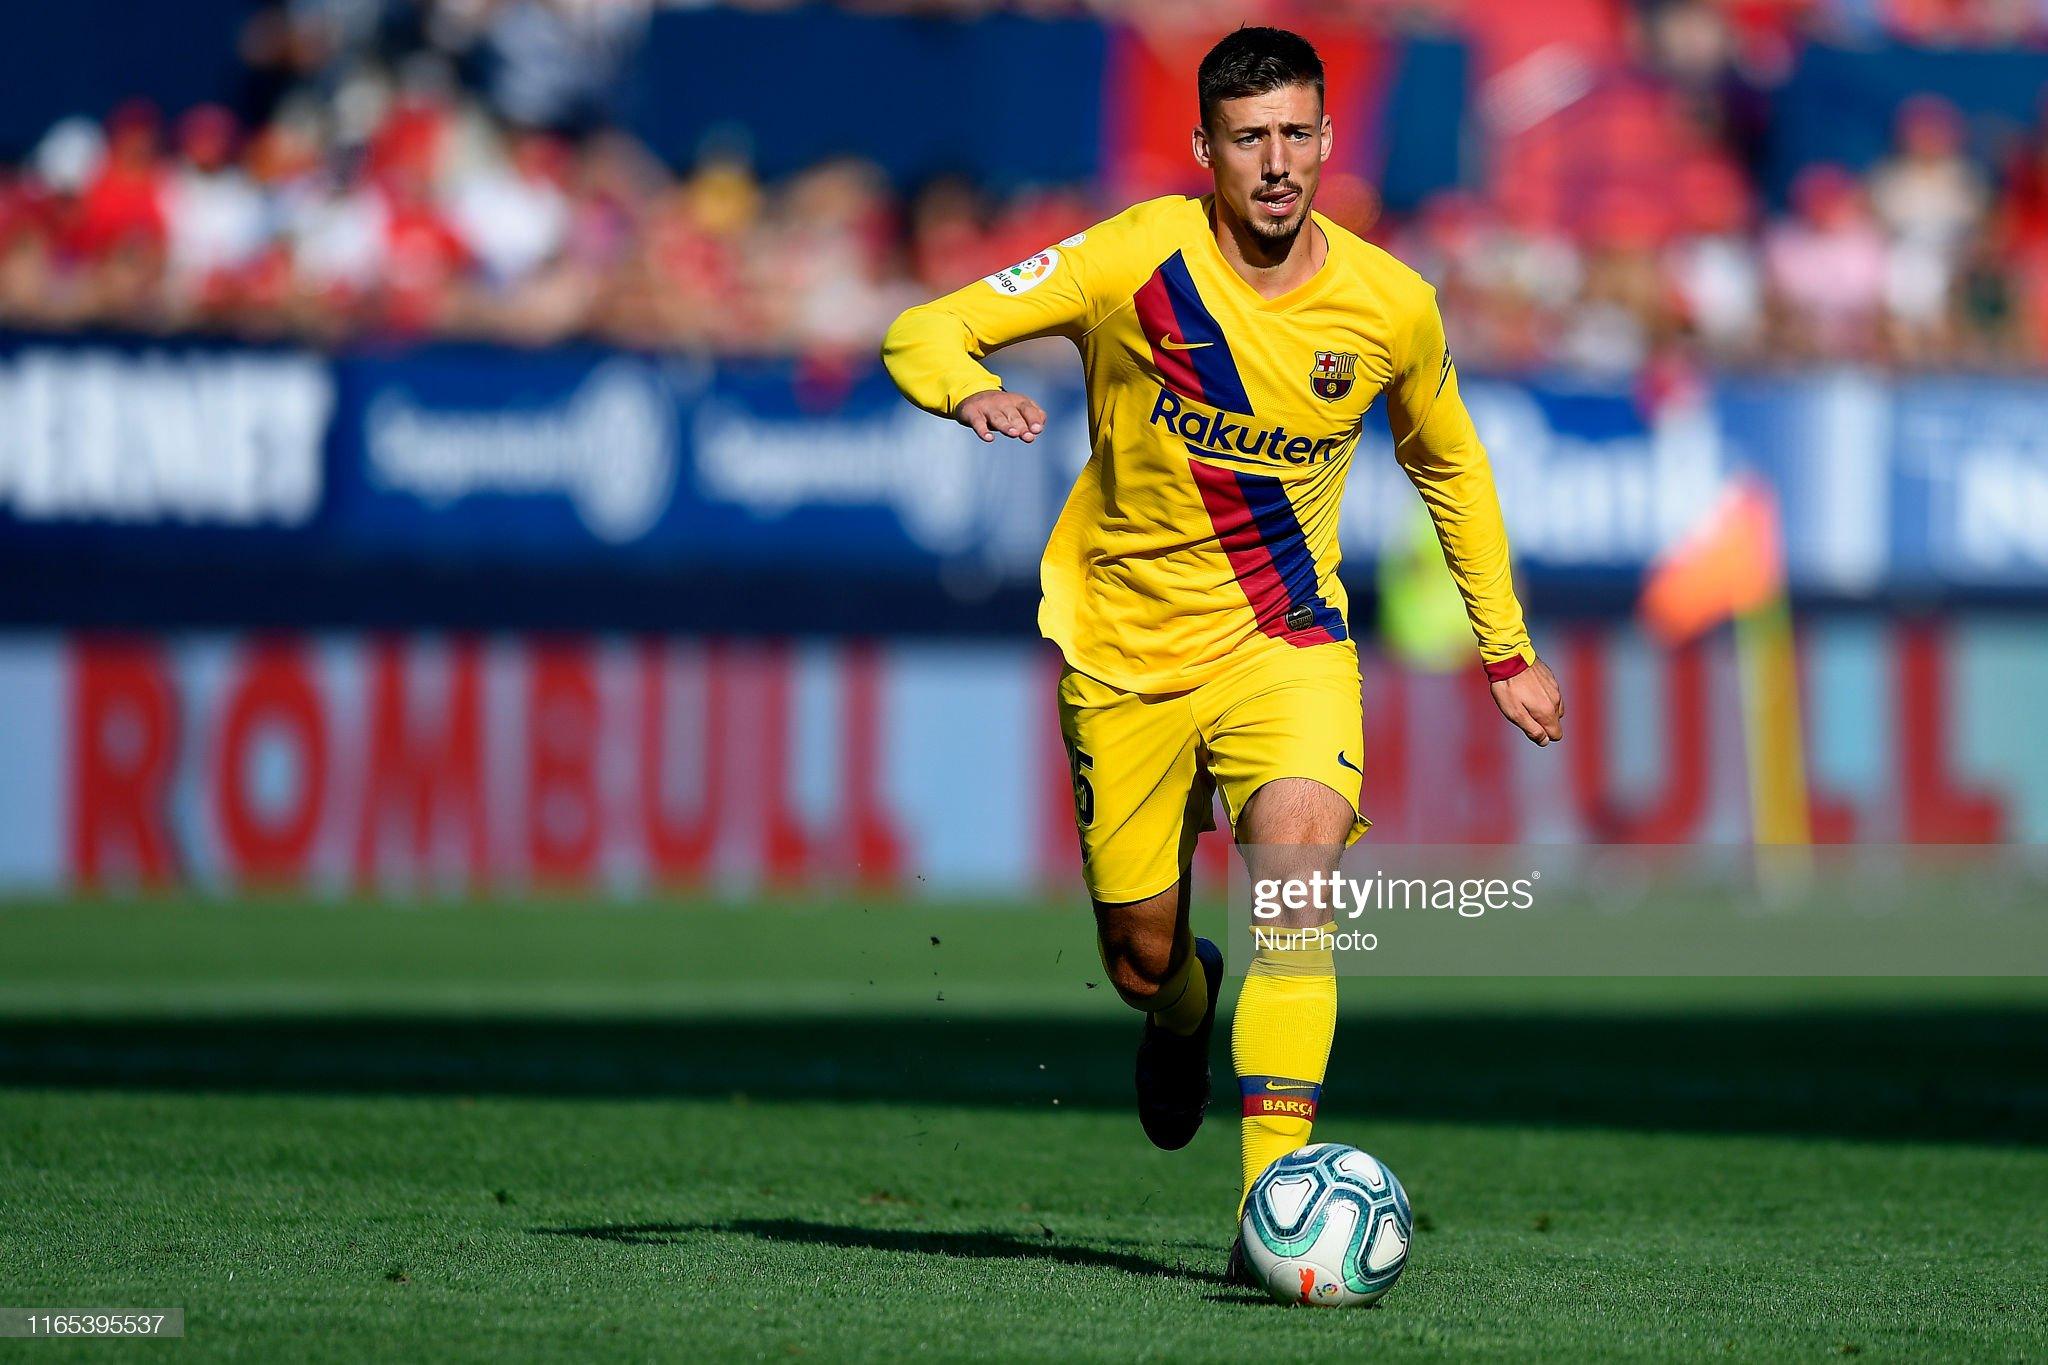 صور مباراة : أوساسونا - برشلونة 2-2 ( 31-08-2019 )  Clement-lenglet-of-barcelona-in-action-during-the-liga-match-between-picture-id1165395537?s=2048x2048